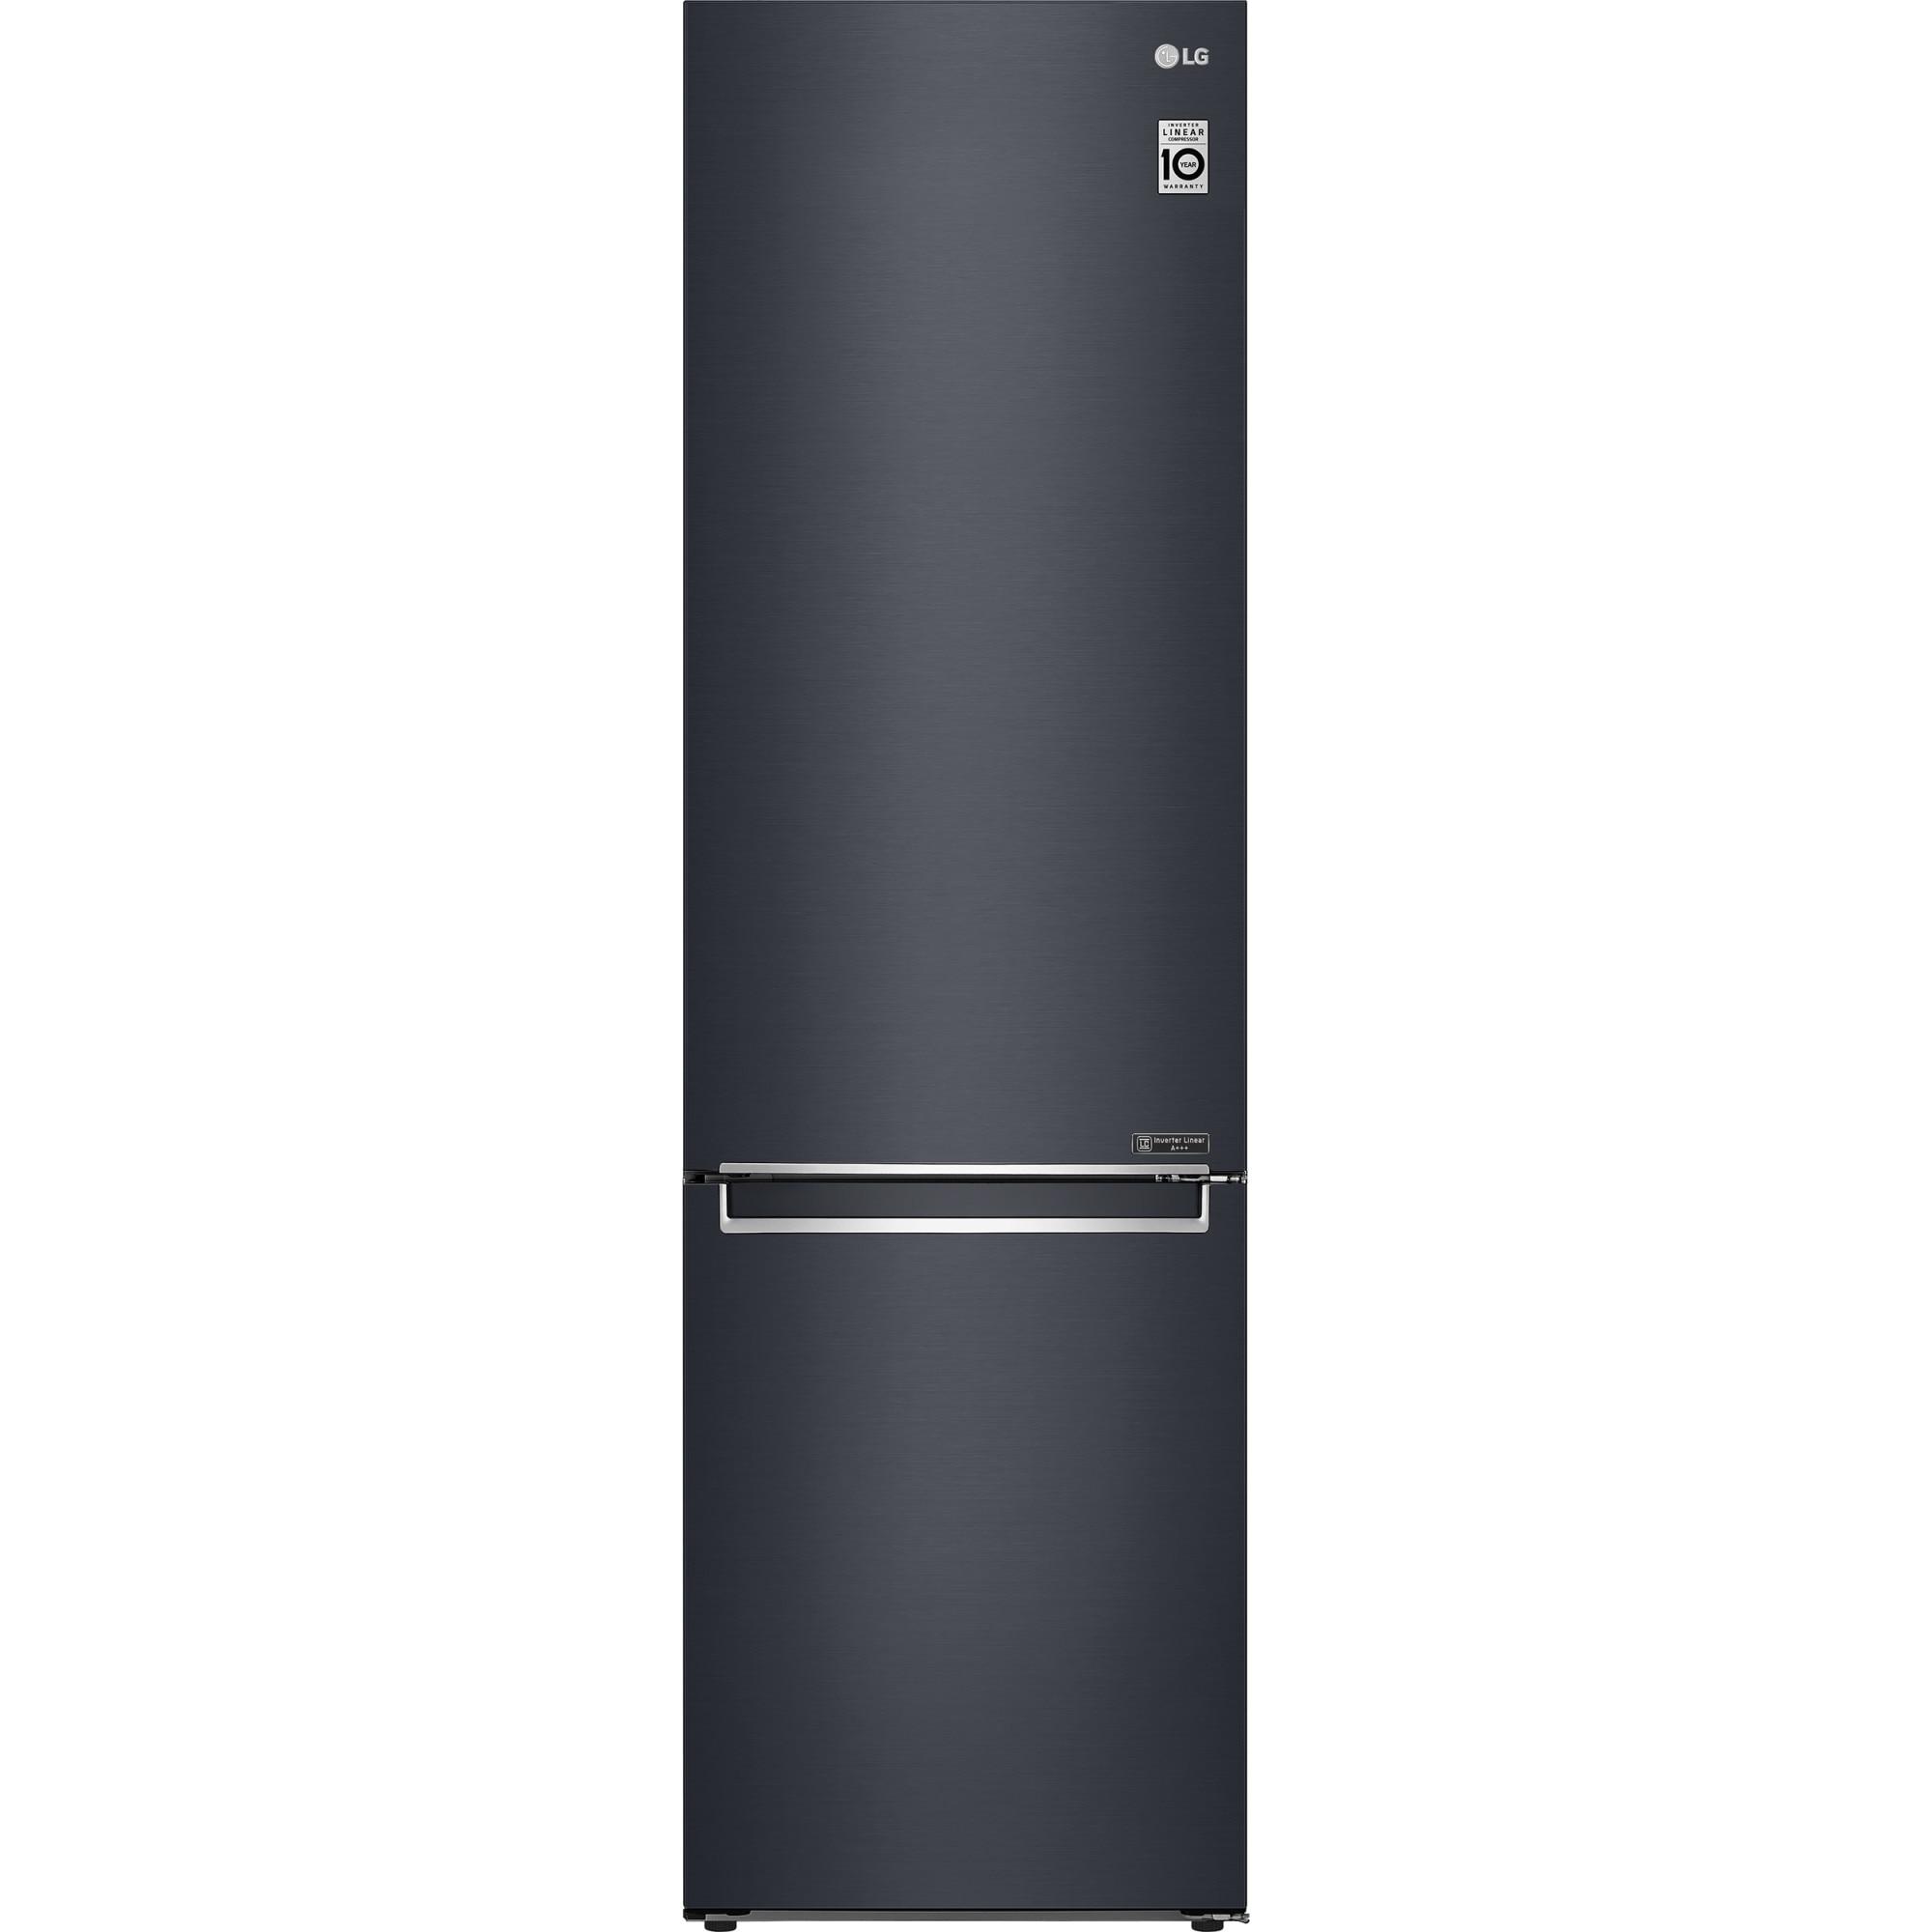 Fotografie Combina frigorifica LG GBB72MCEFN, 384 l, Clasa D, Full NoFrost, Compresor Inverter Linear, H 203 cm, Negru